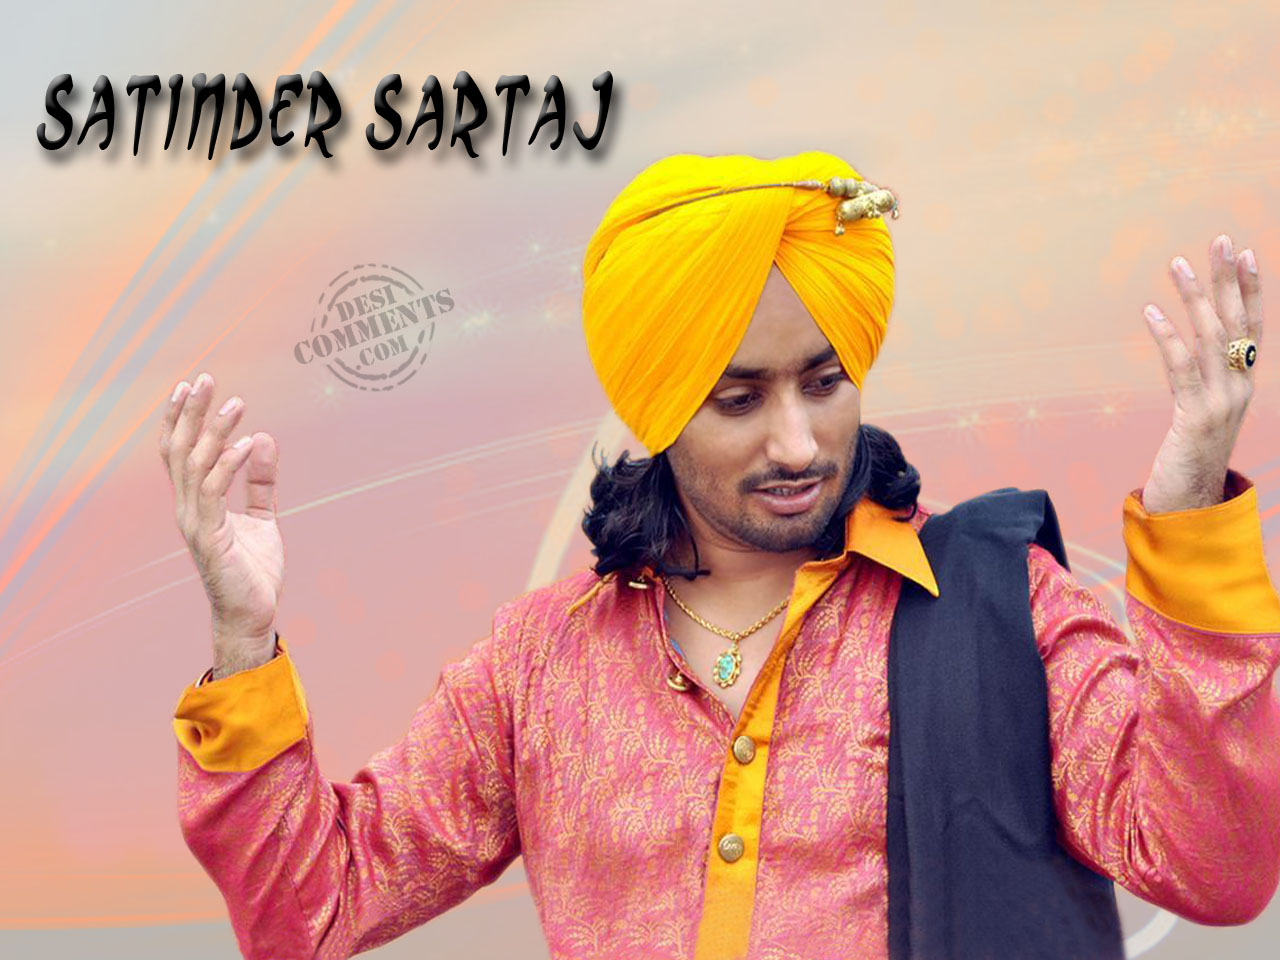 Hindi Sad Wallpapers With Quotes Satinder Sartaj Punjabi Celebrities Wallpapers